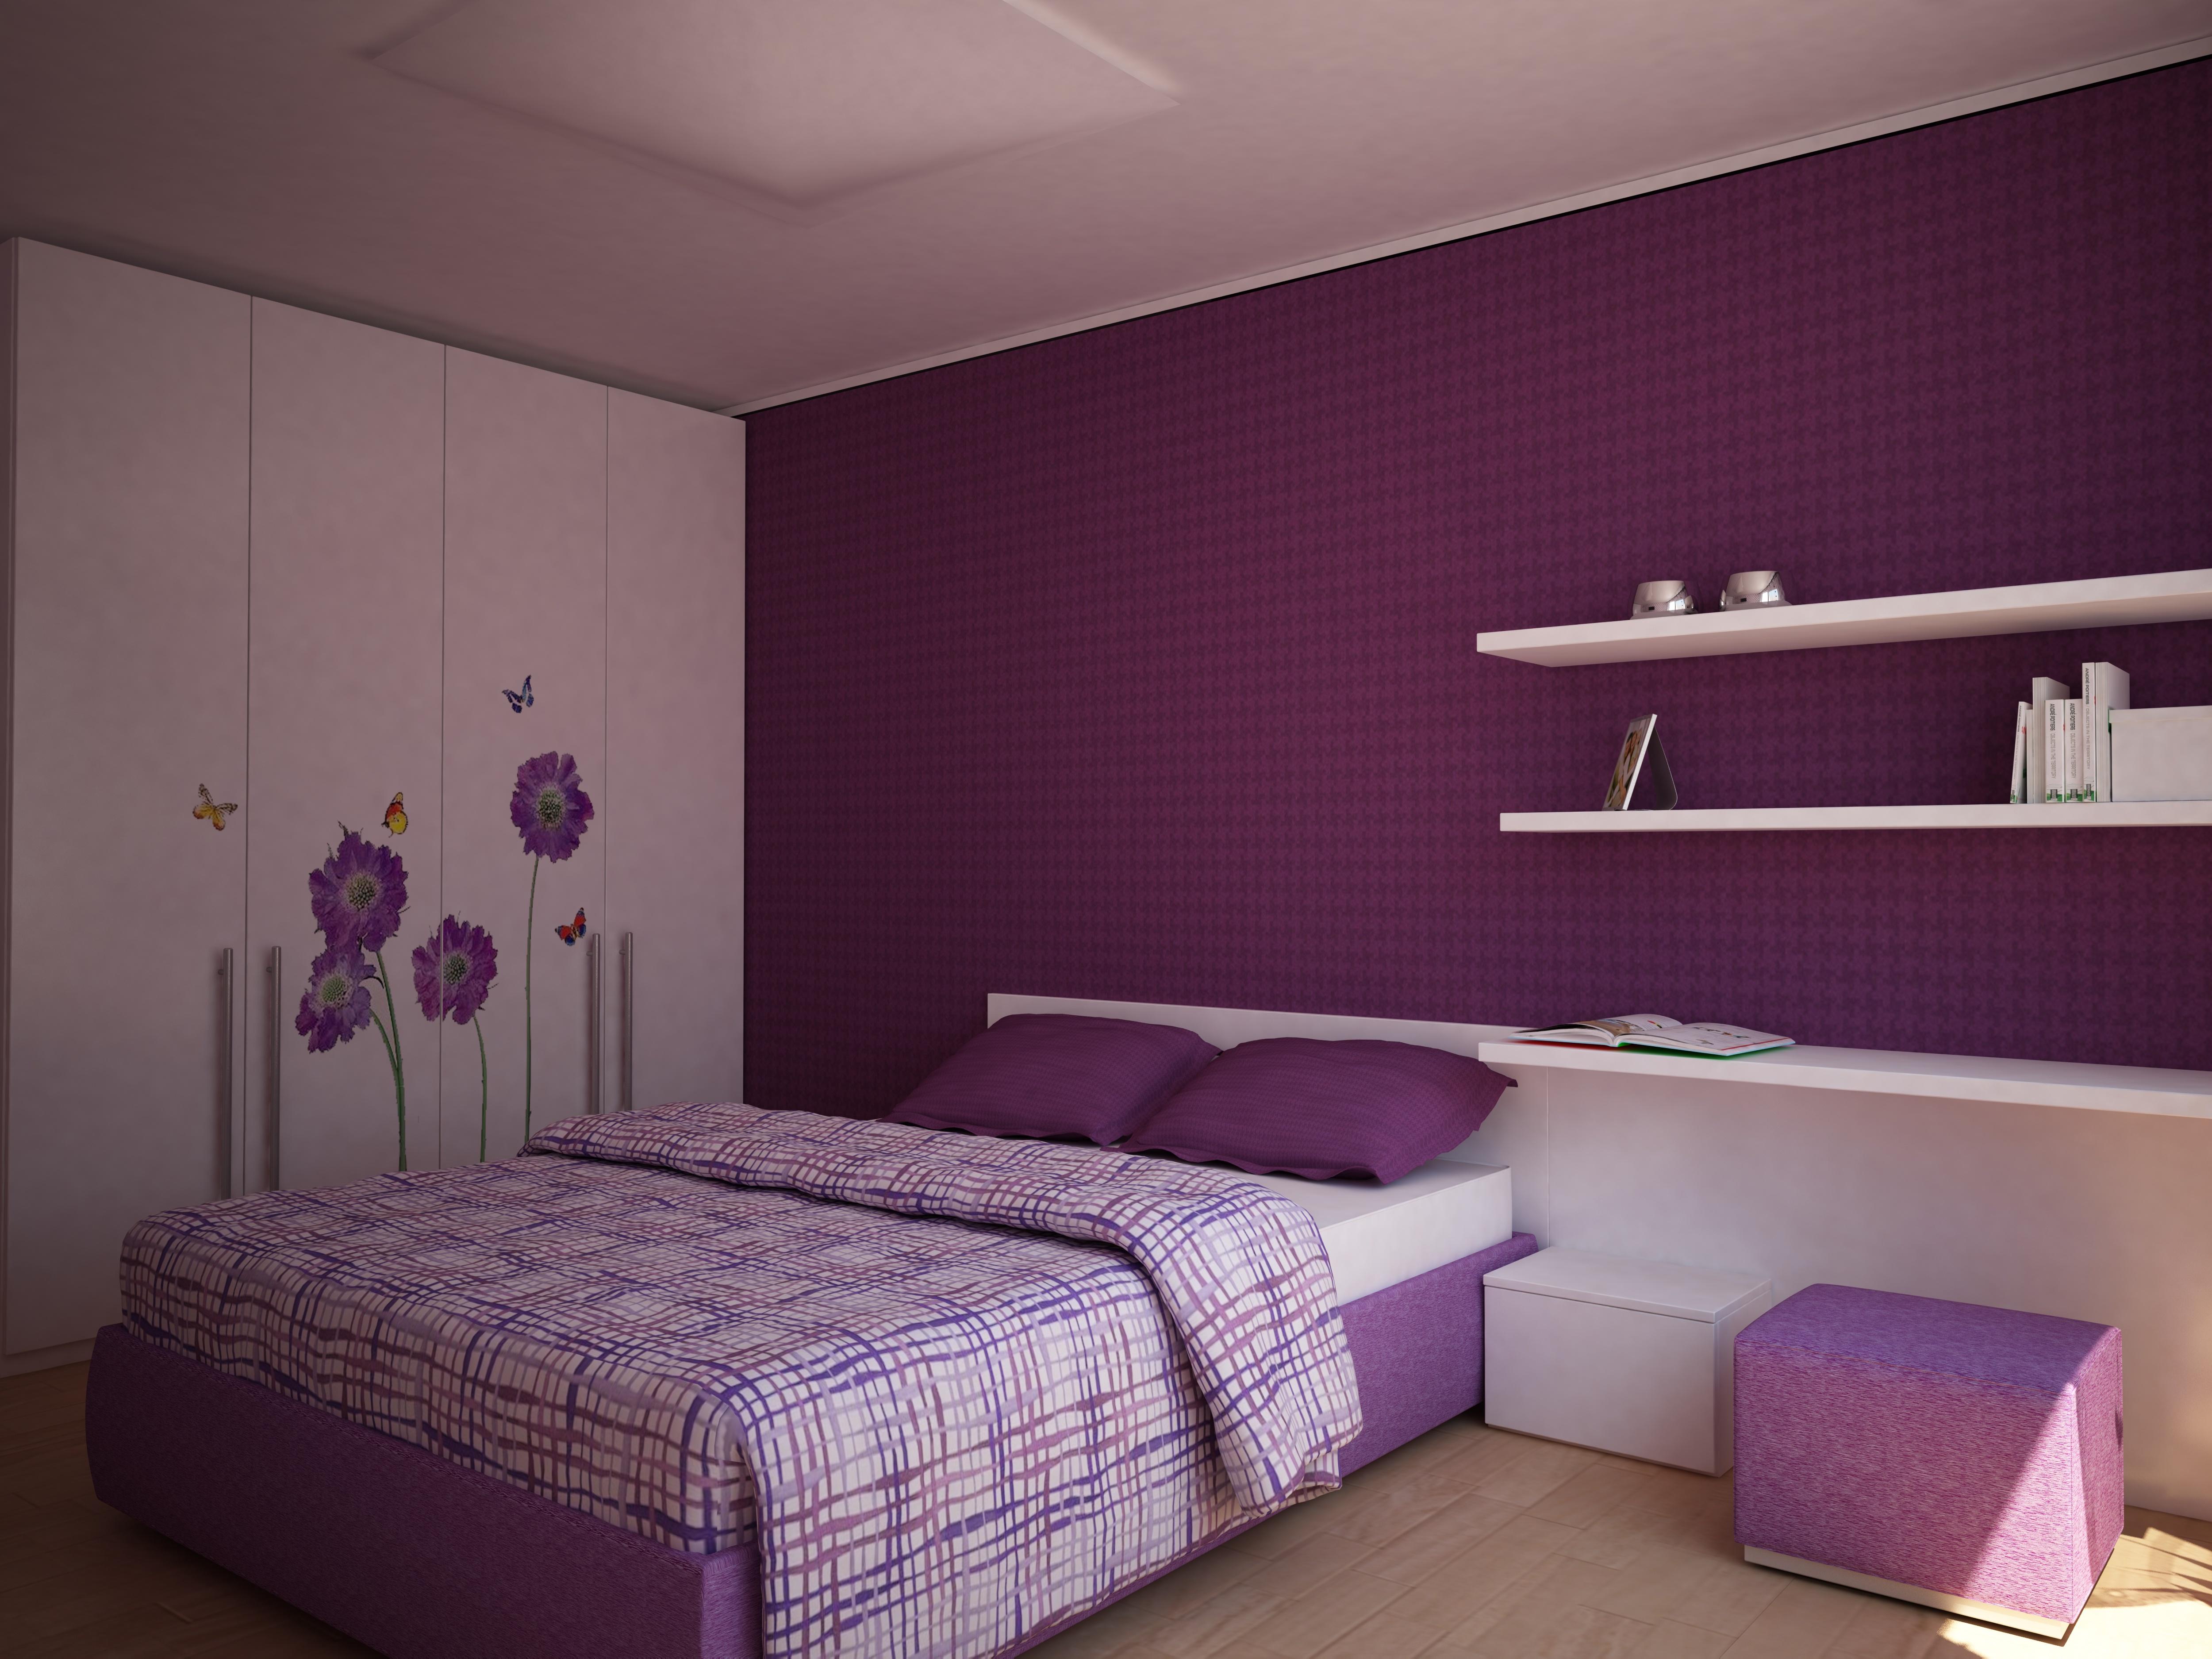 Sypialnia fioletowa